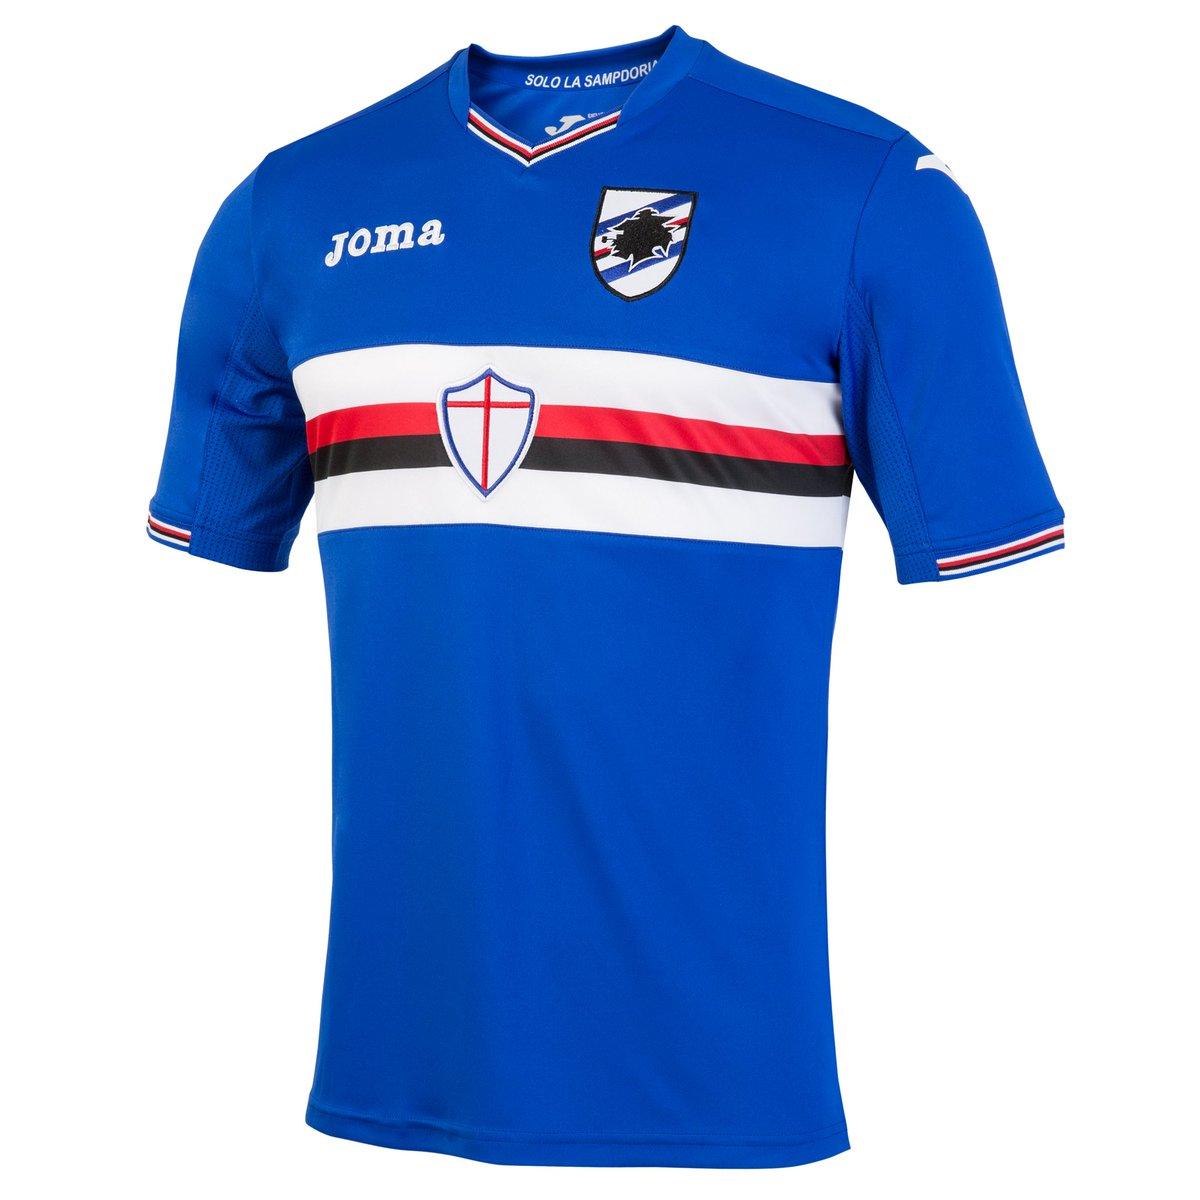 [2015/2016] Calcio CnUV460XYAAE7o4